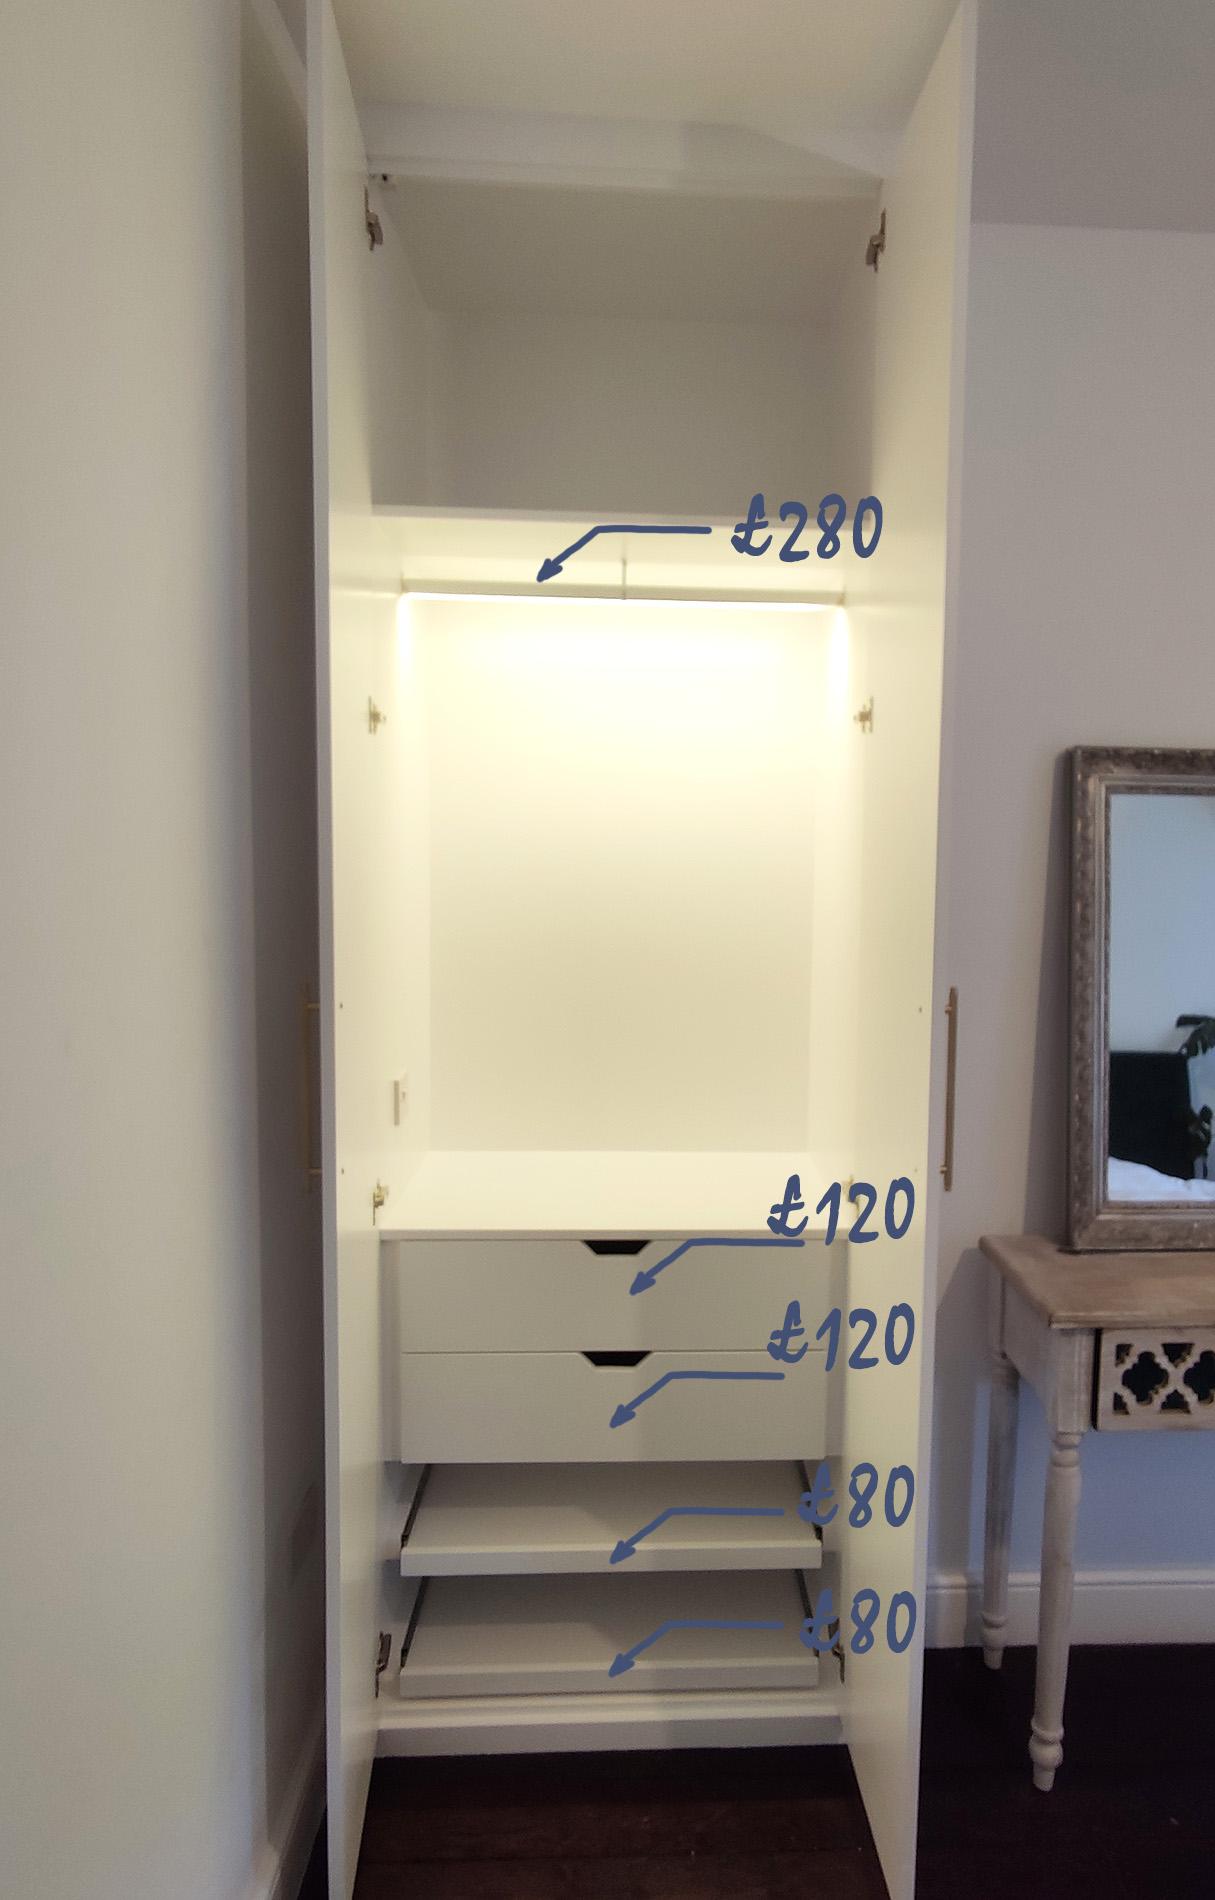 cost of wardrobe interior features